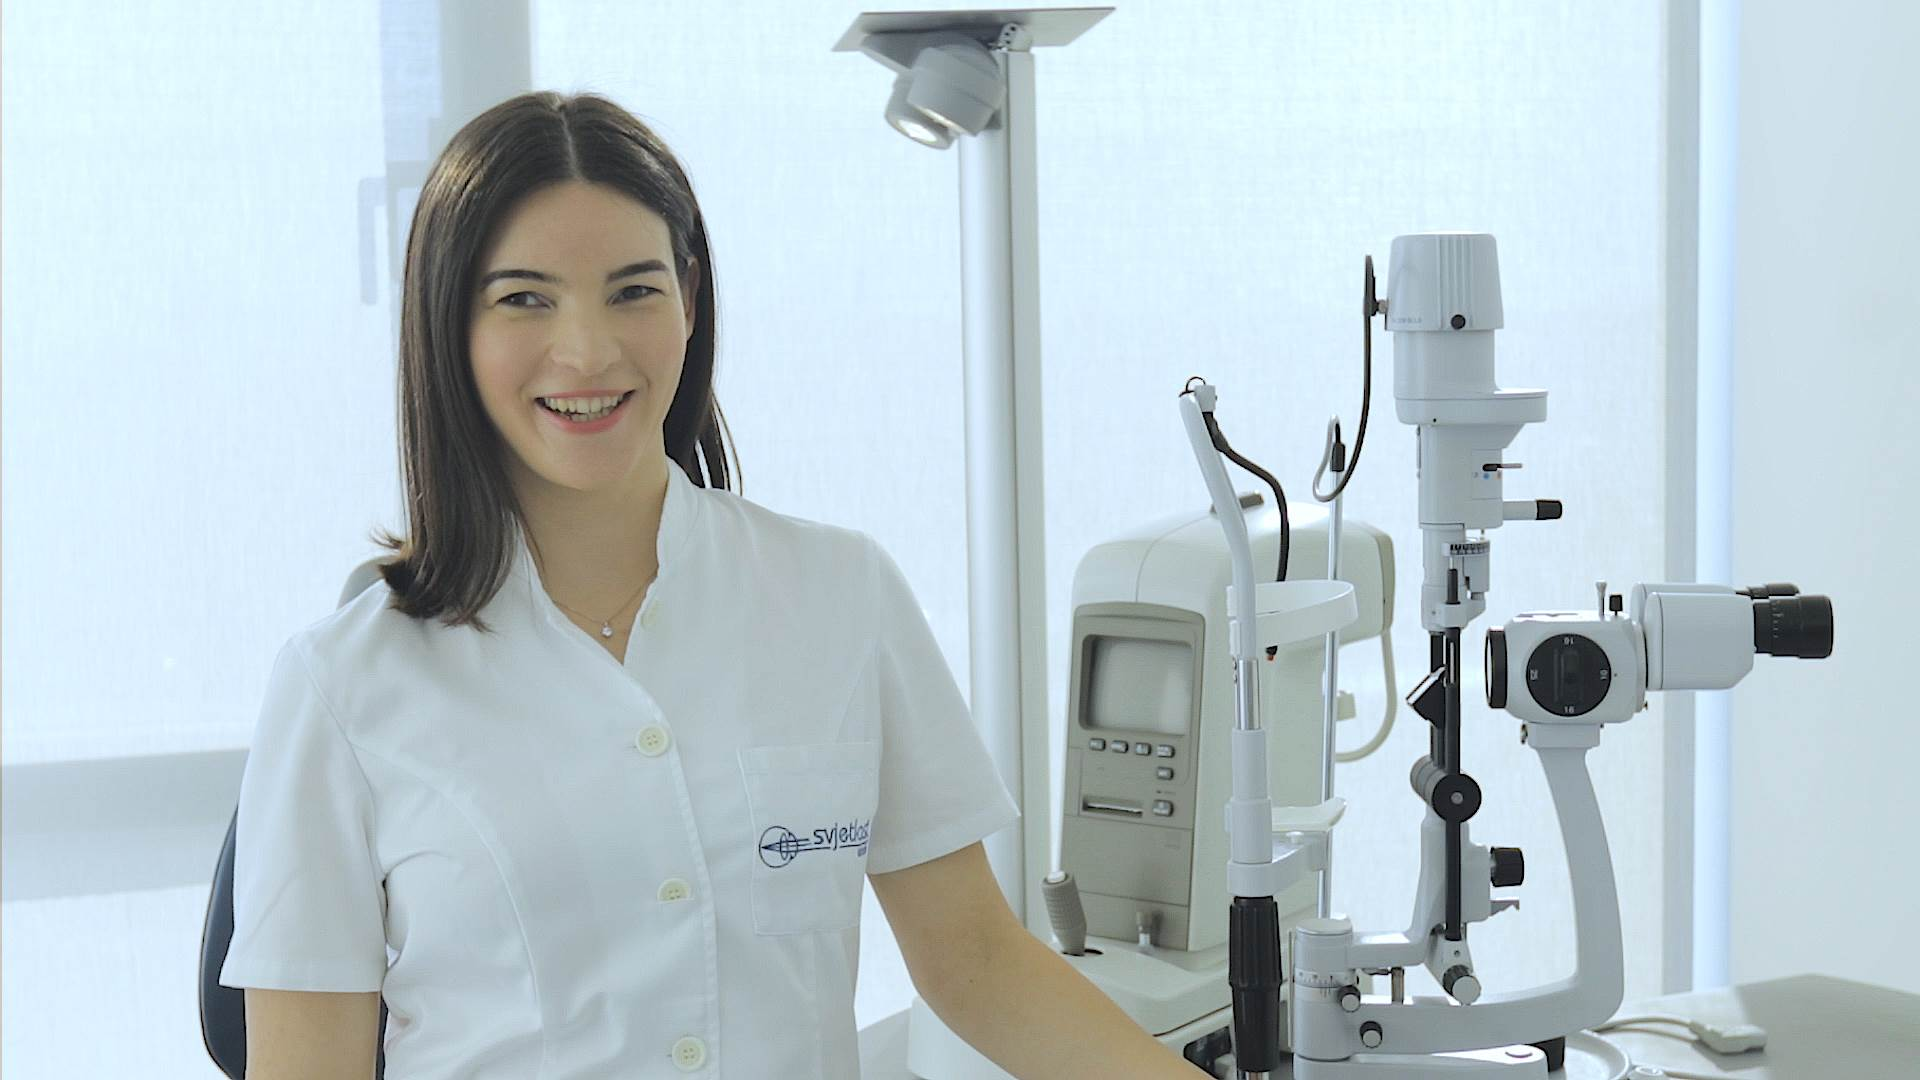 MONDO klinika: Glaukom, tihi ubica vida (VIDEO)